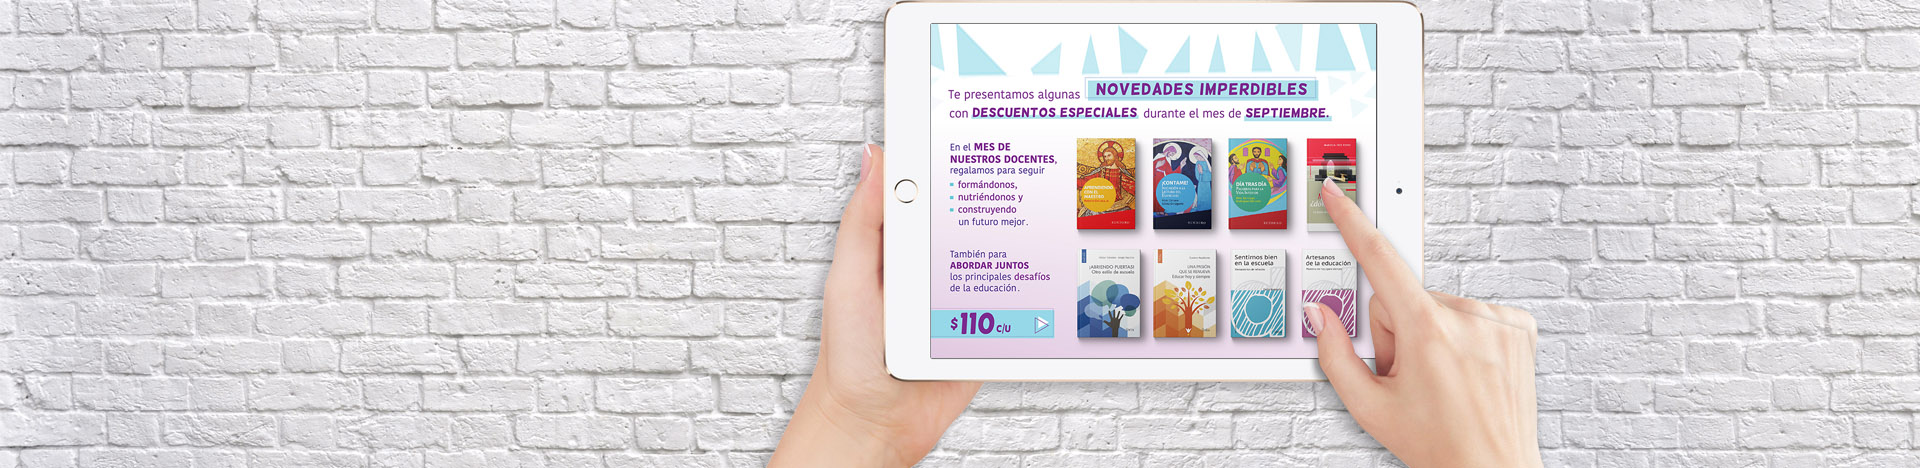 bg_docente-tablet2017